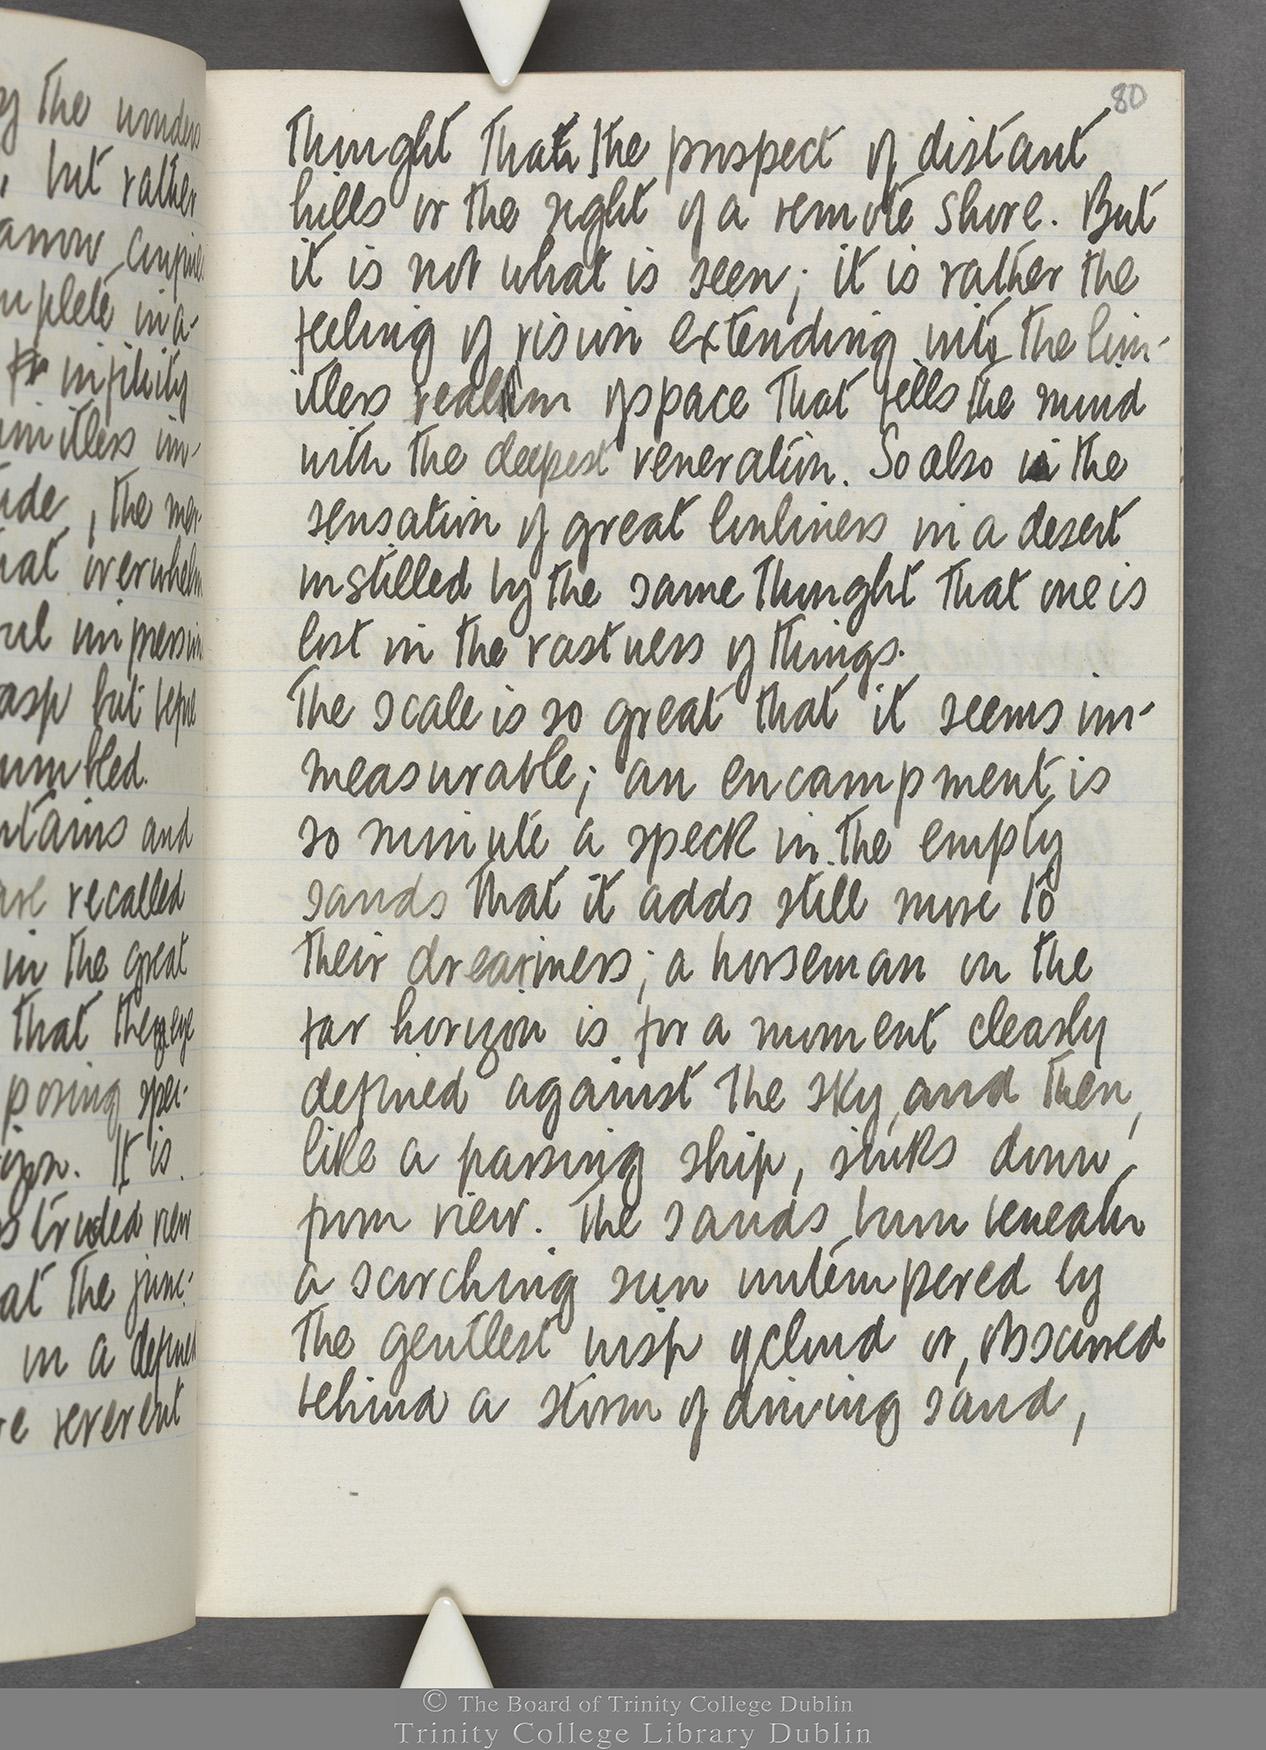 TCD MS 10515 folio 80 recto